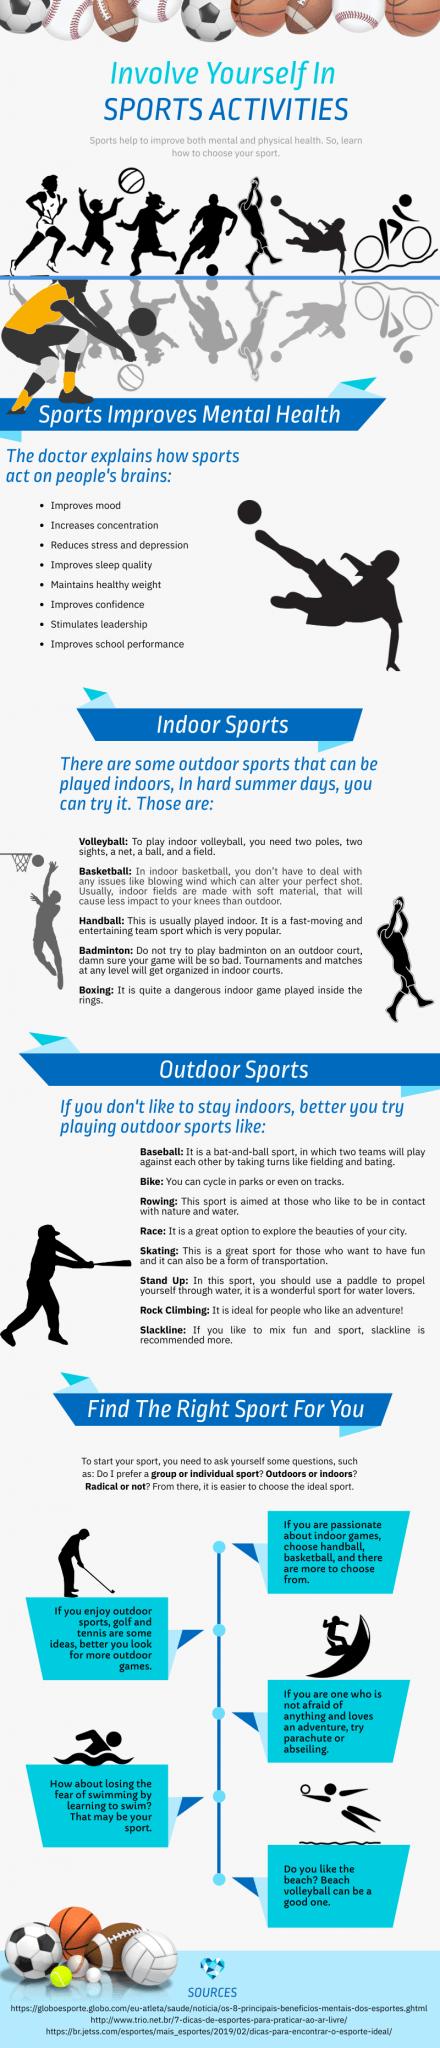 Basic Rules of Baseball